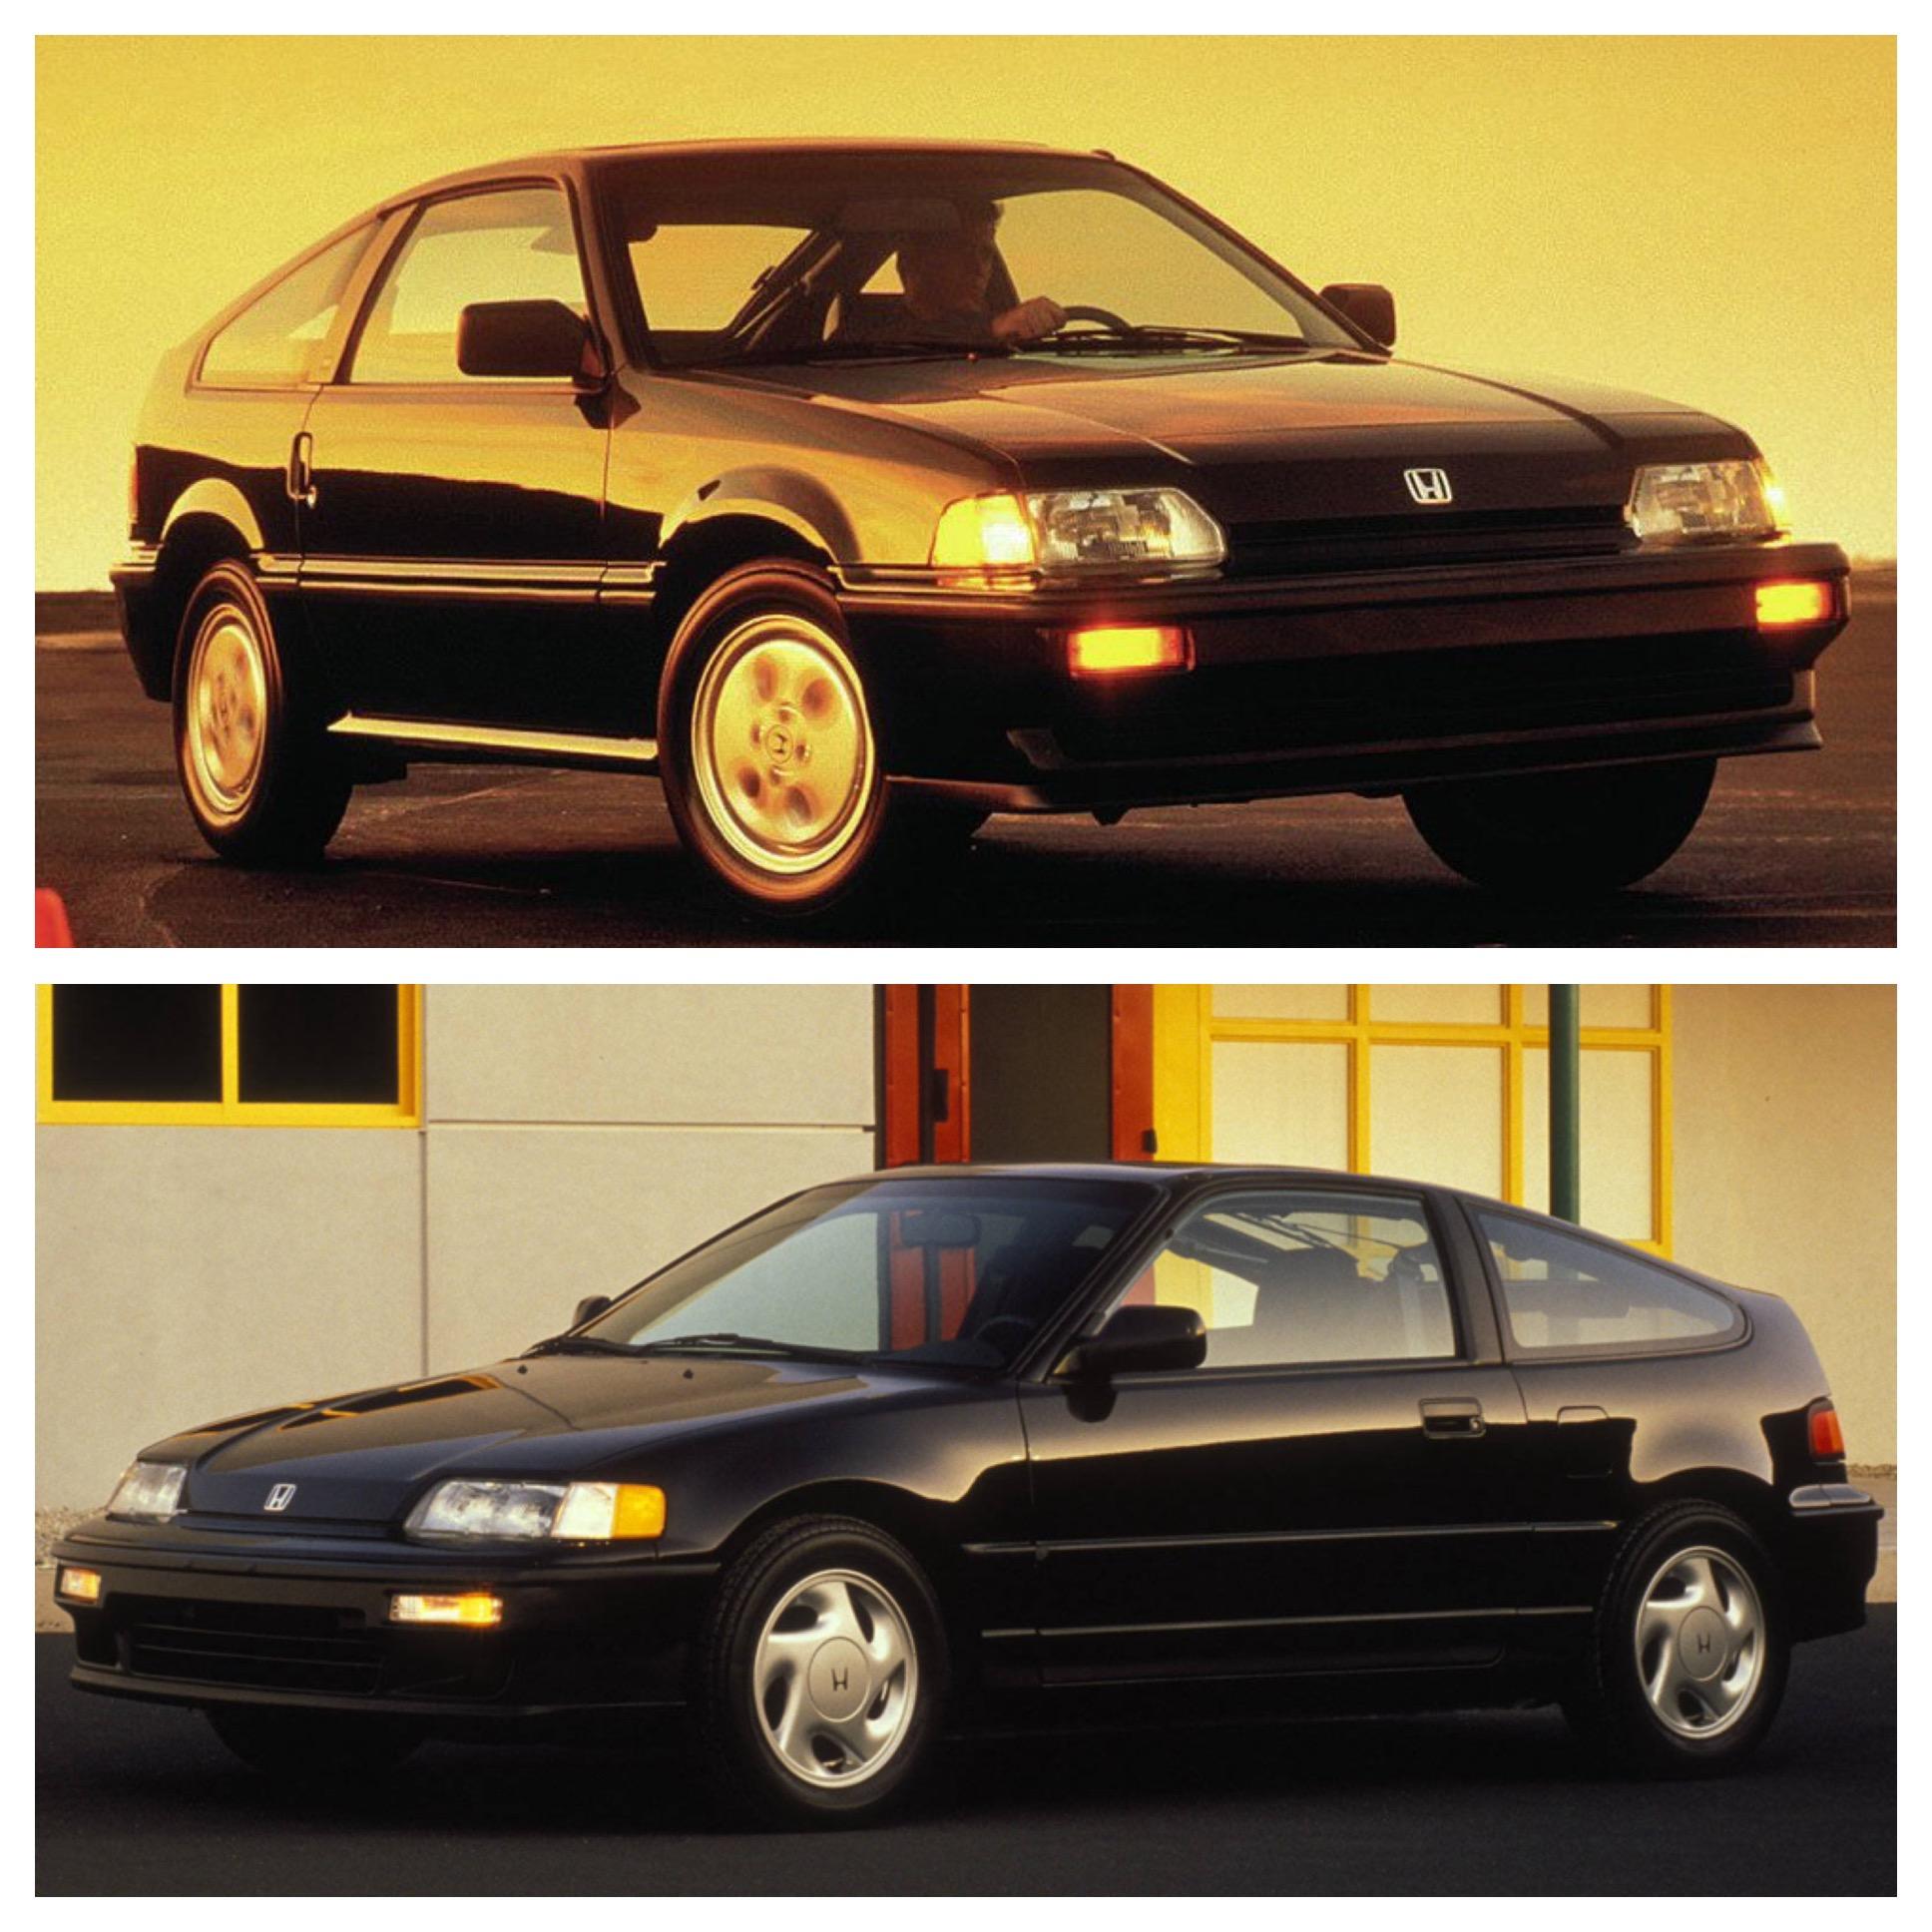 CRX 1984-1991 -